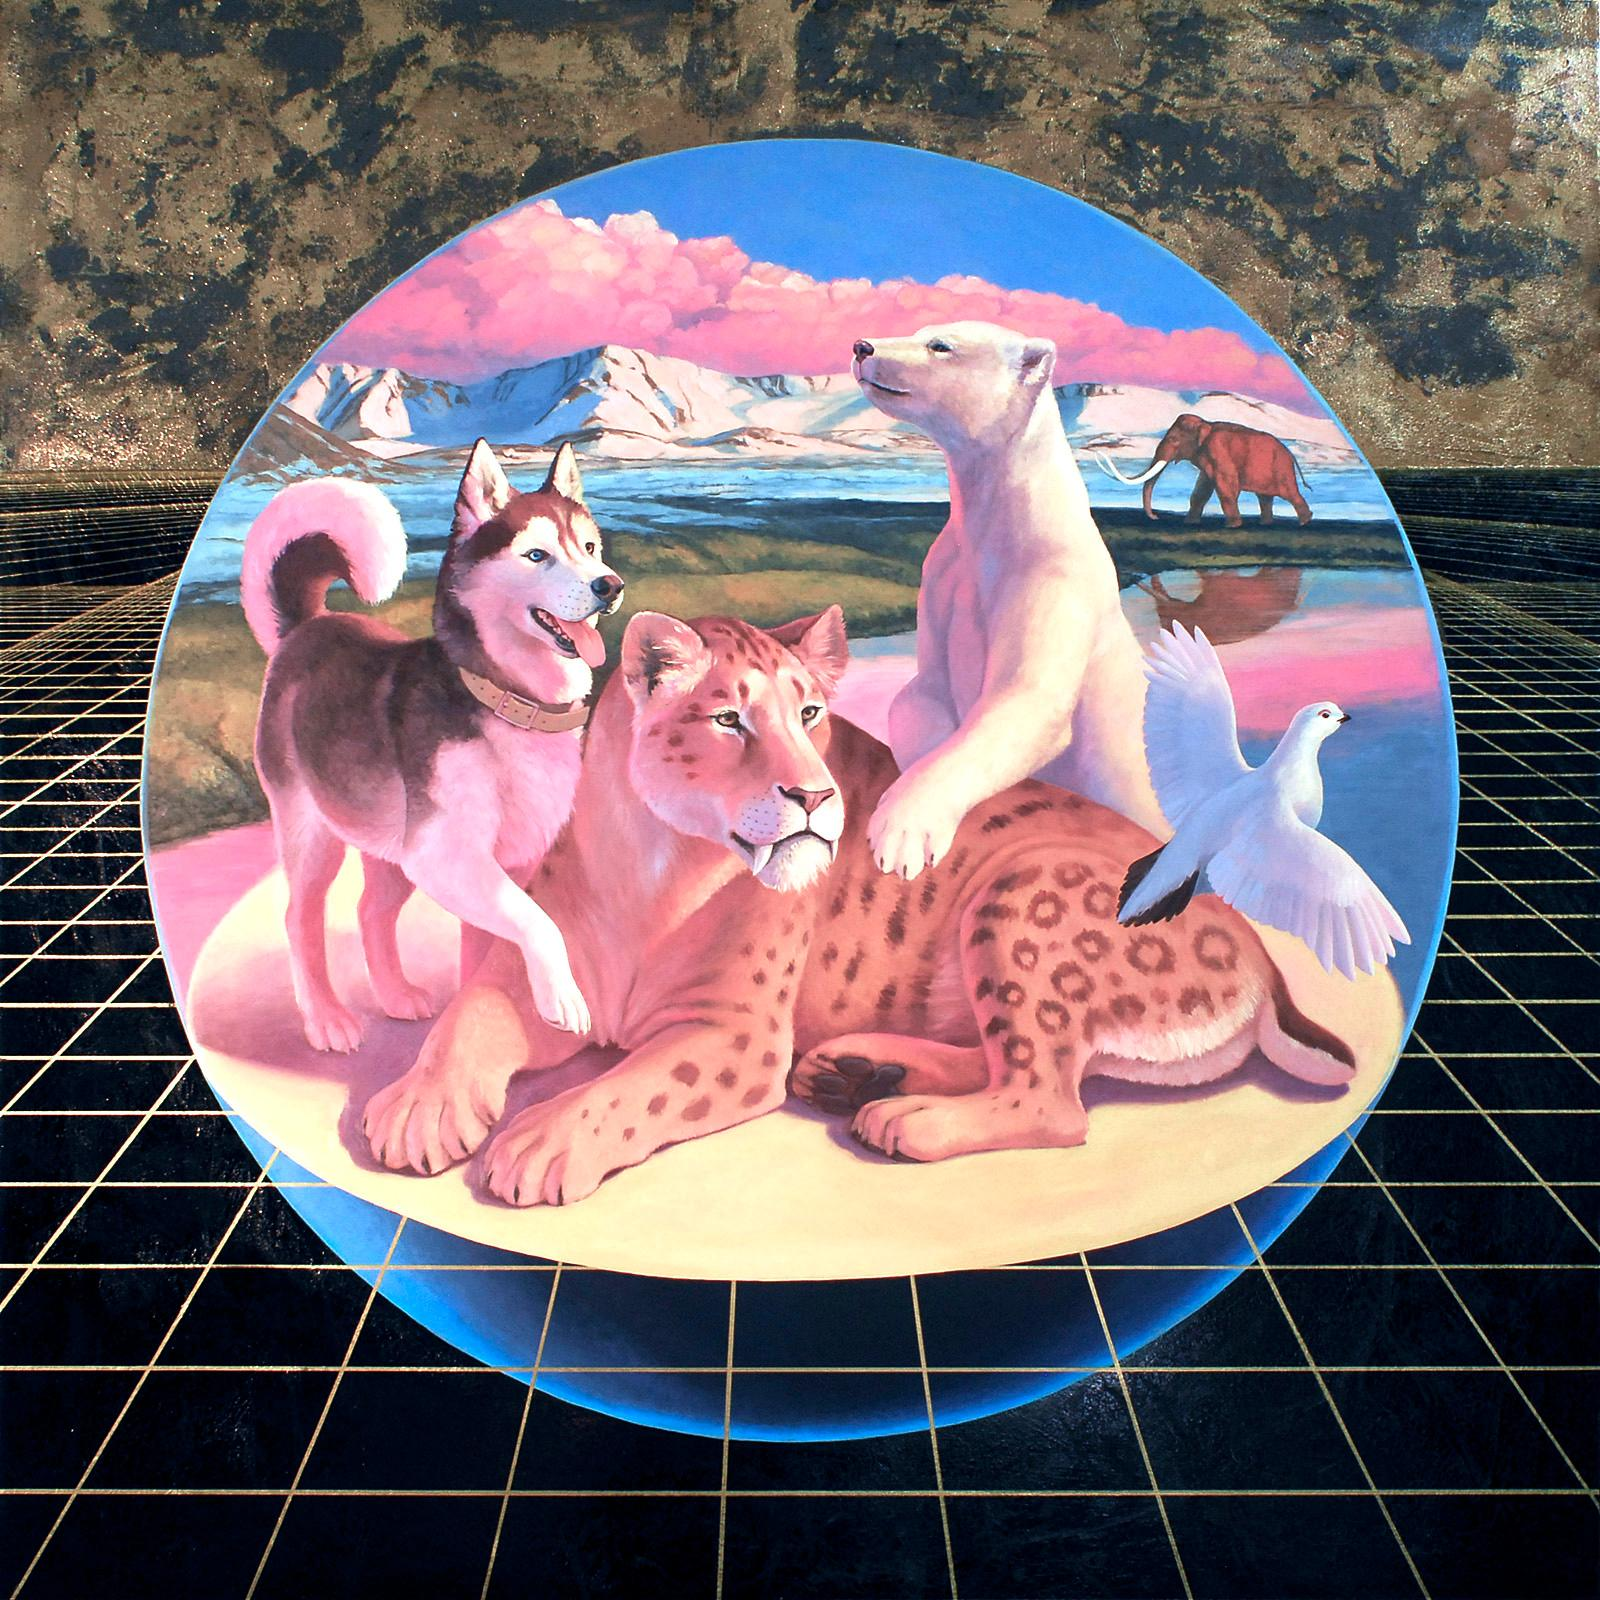 Permafrost, oil & acrylic on panel, figurative, animals, landscape, surreal